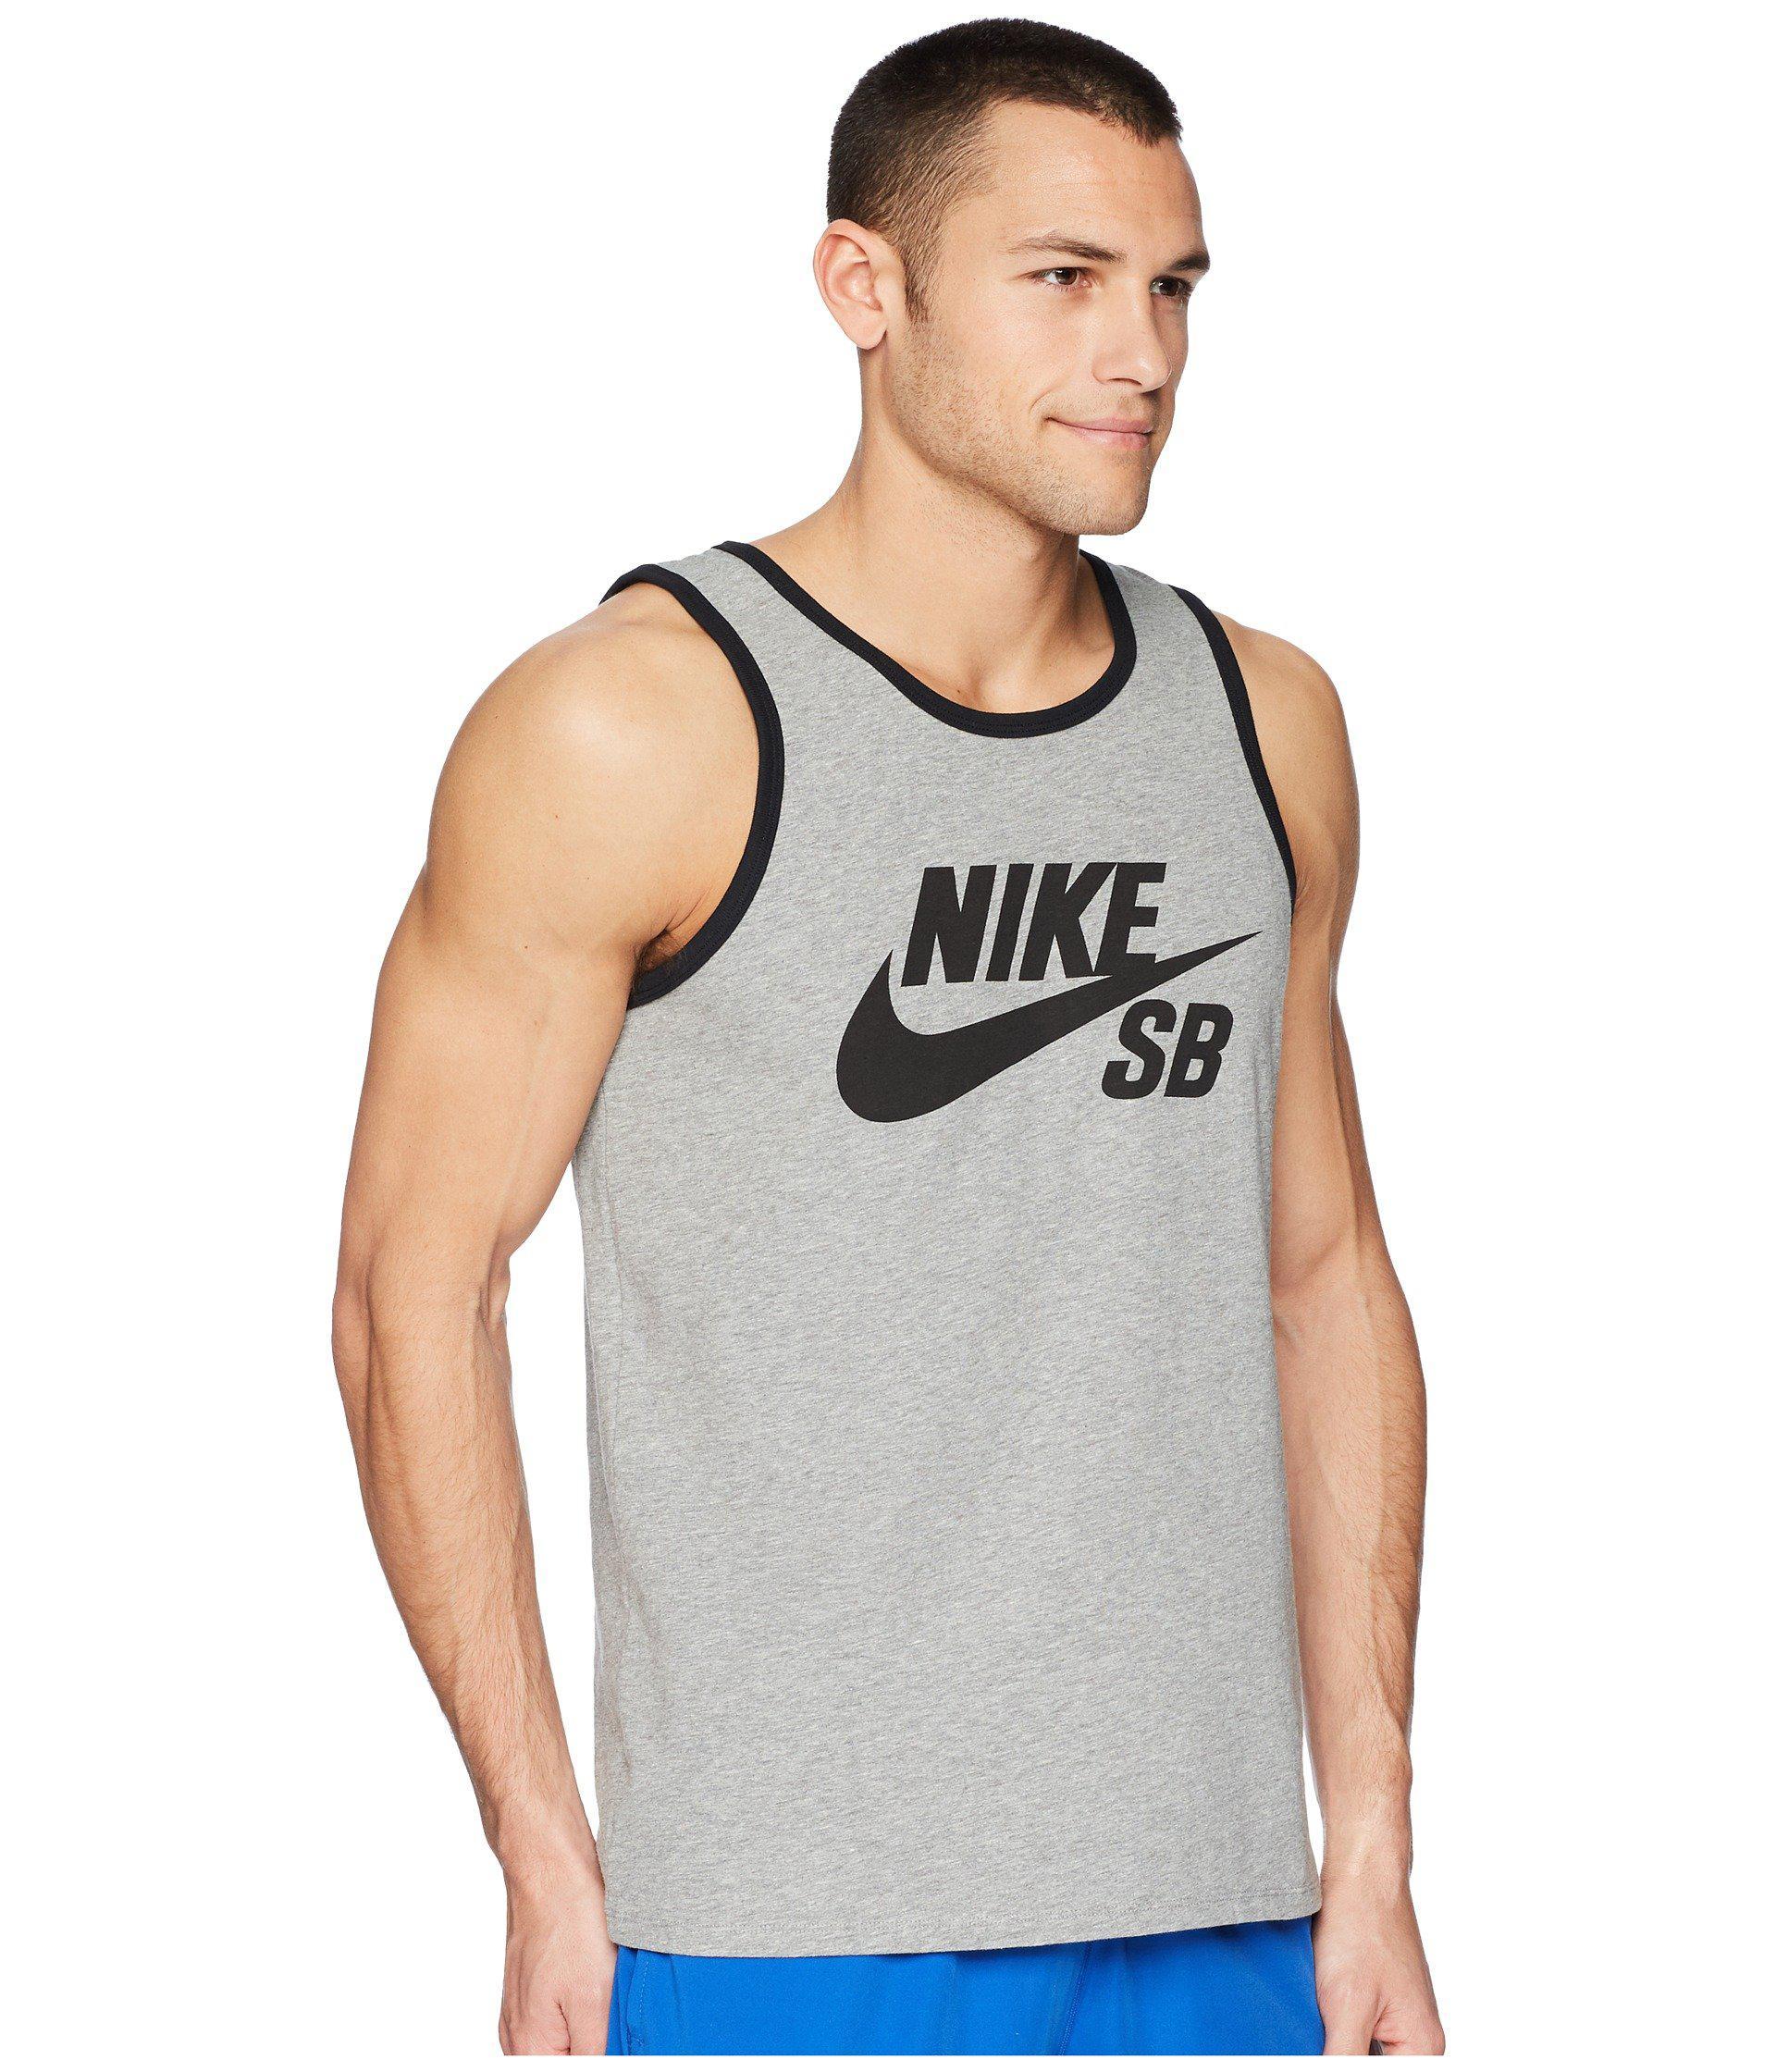 c700b14a2222b3 Lyst - Nike Sb Tank Top Ringer in Gray for Men